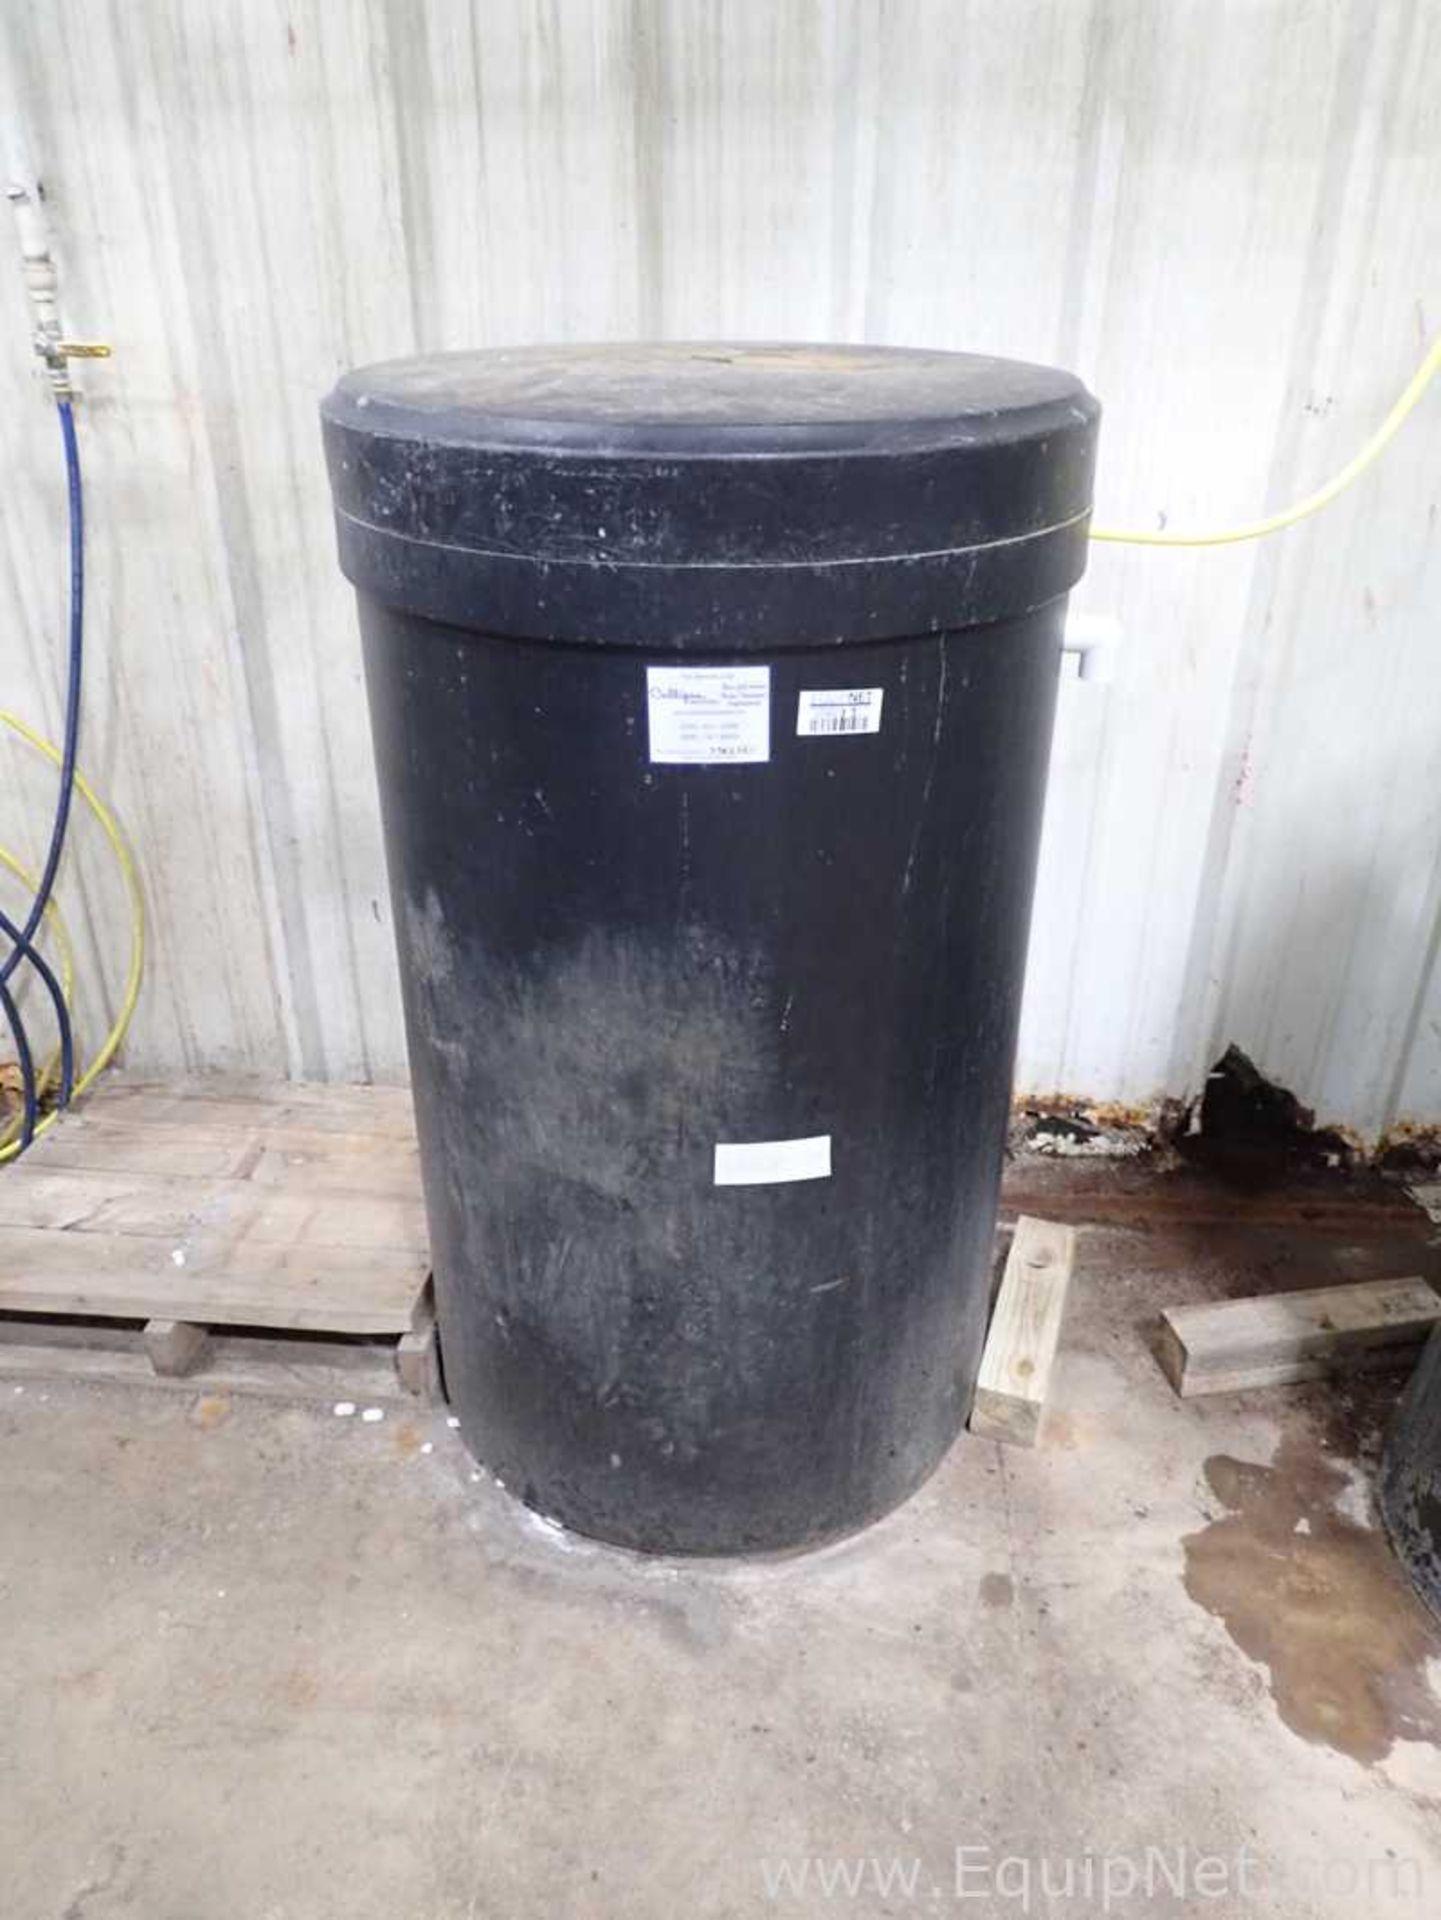 Culligan Hi-Flo 3e Water Softener System - Image 2 of 9